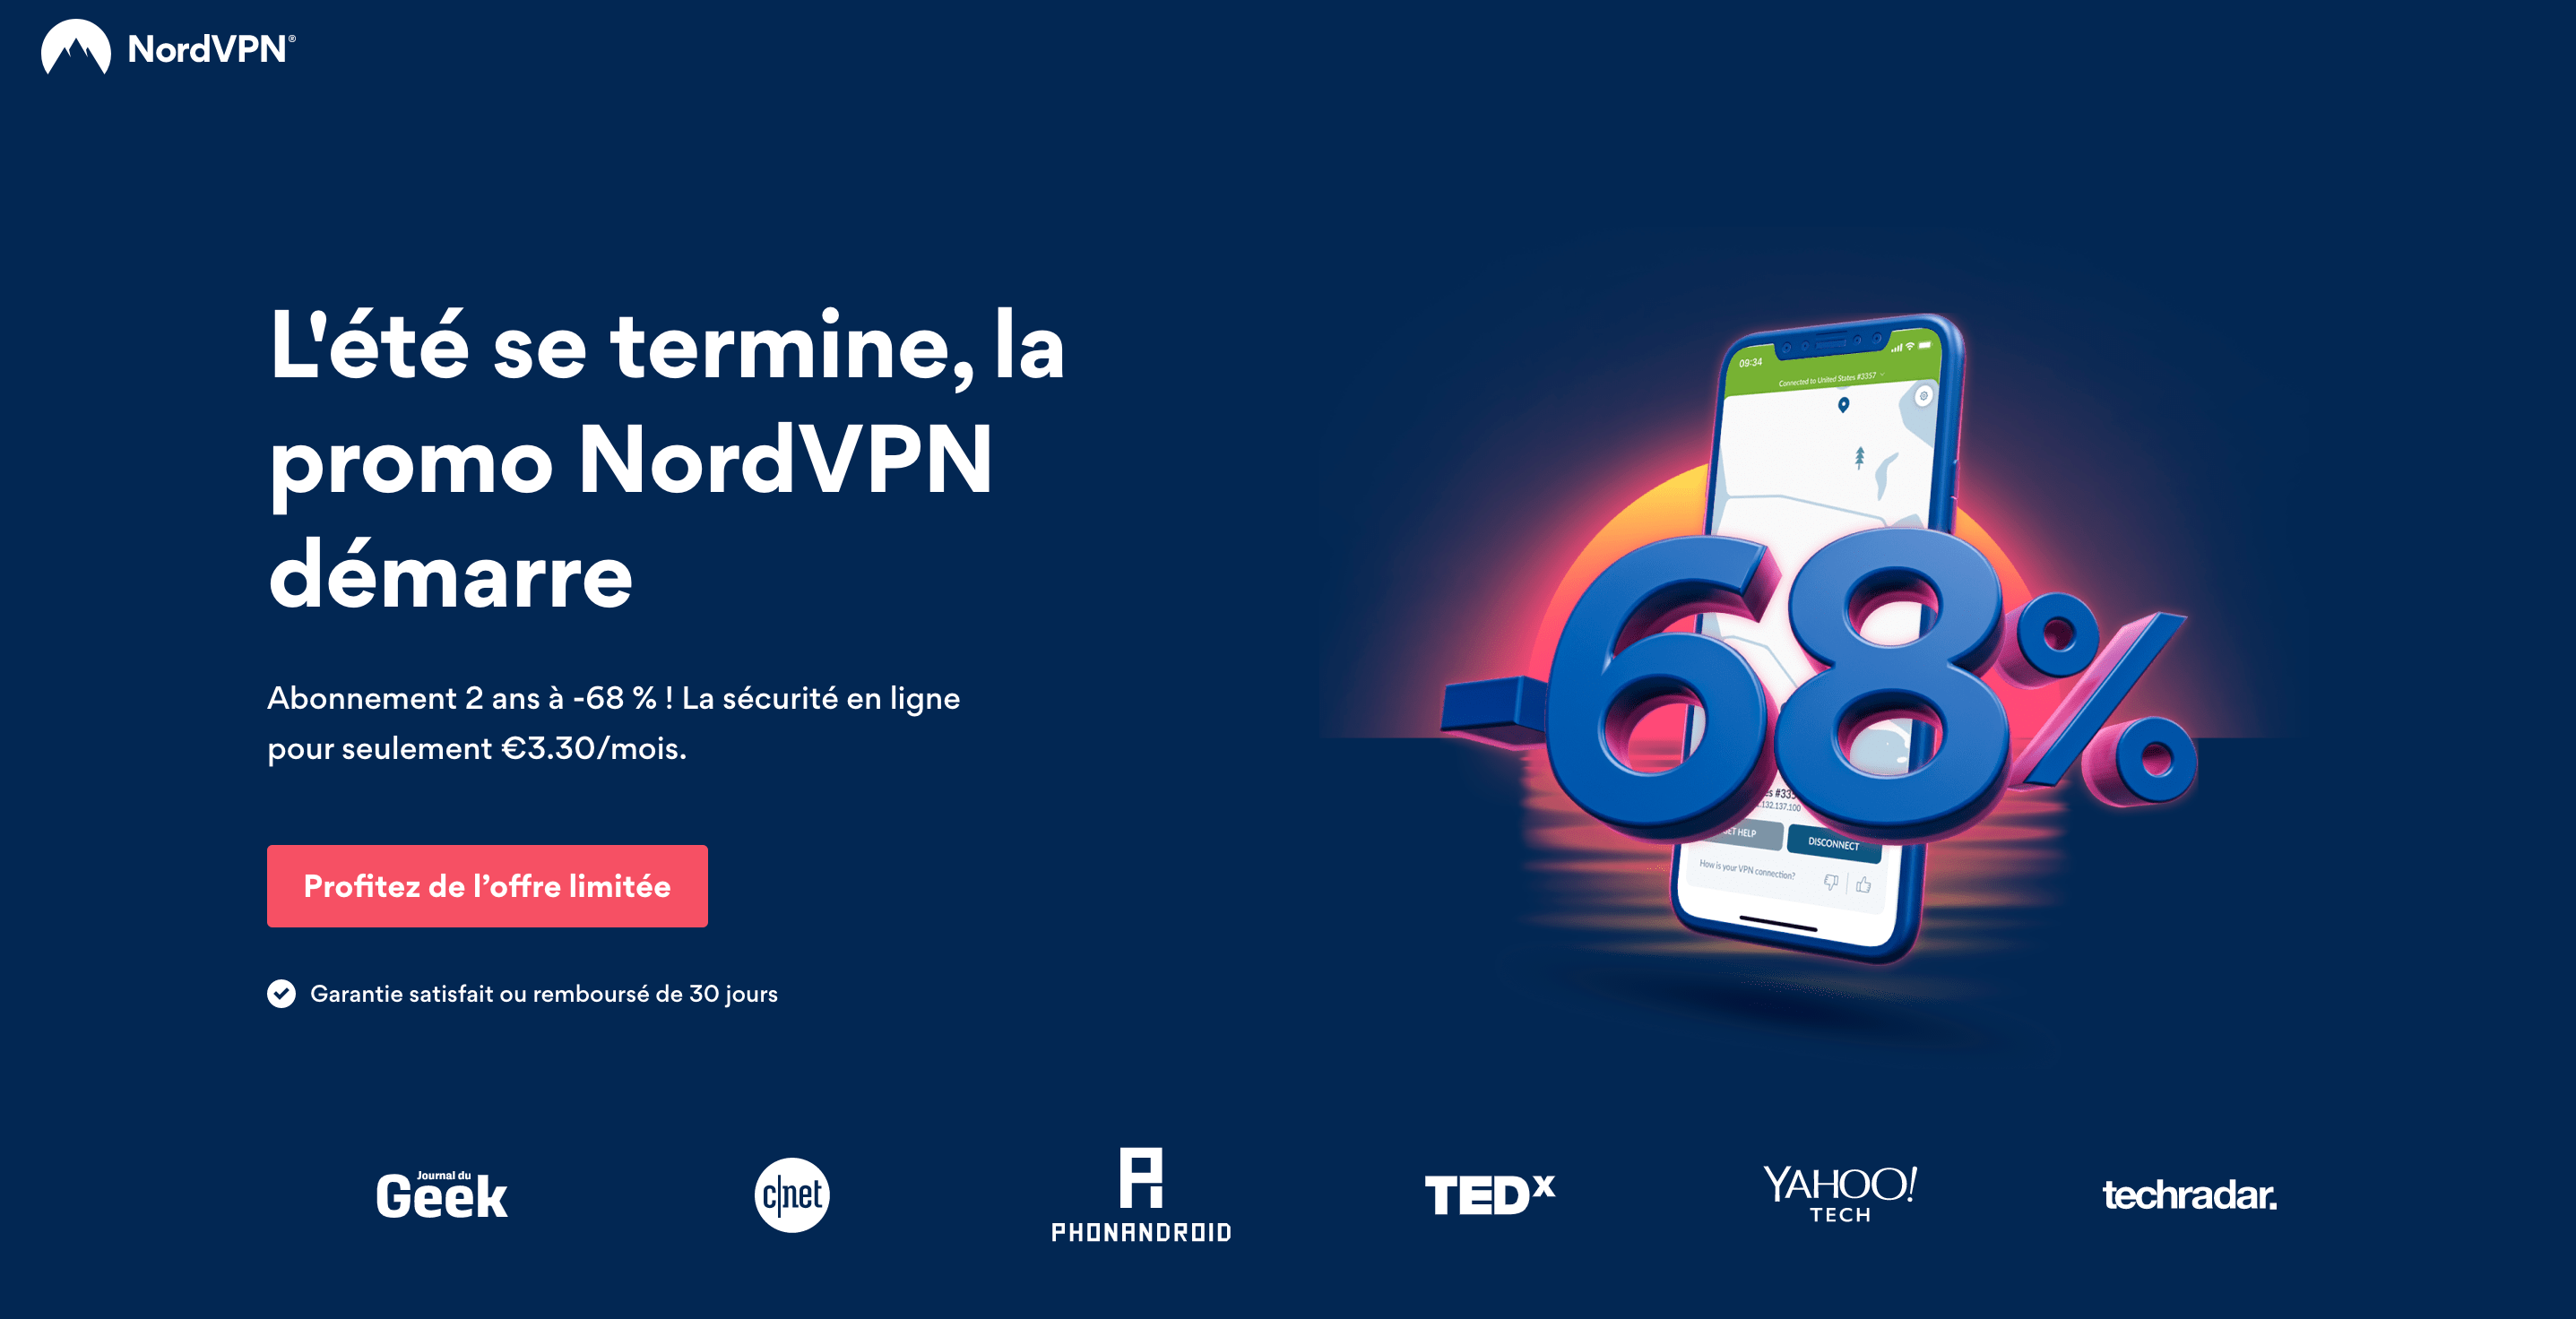 NordVPN en promotion grâce au code promo Amixem